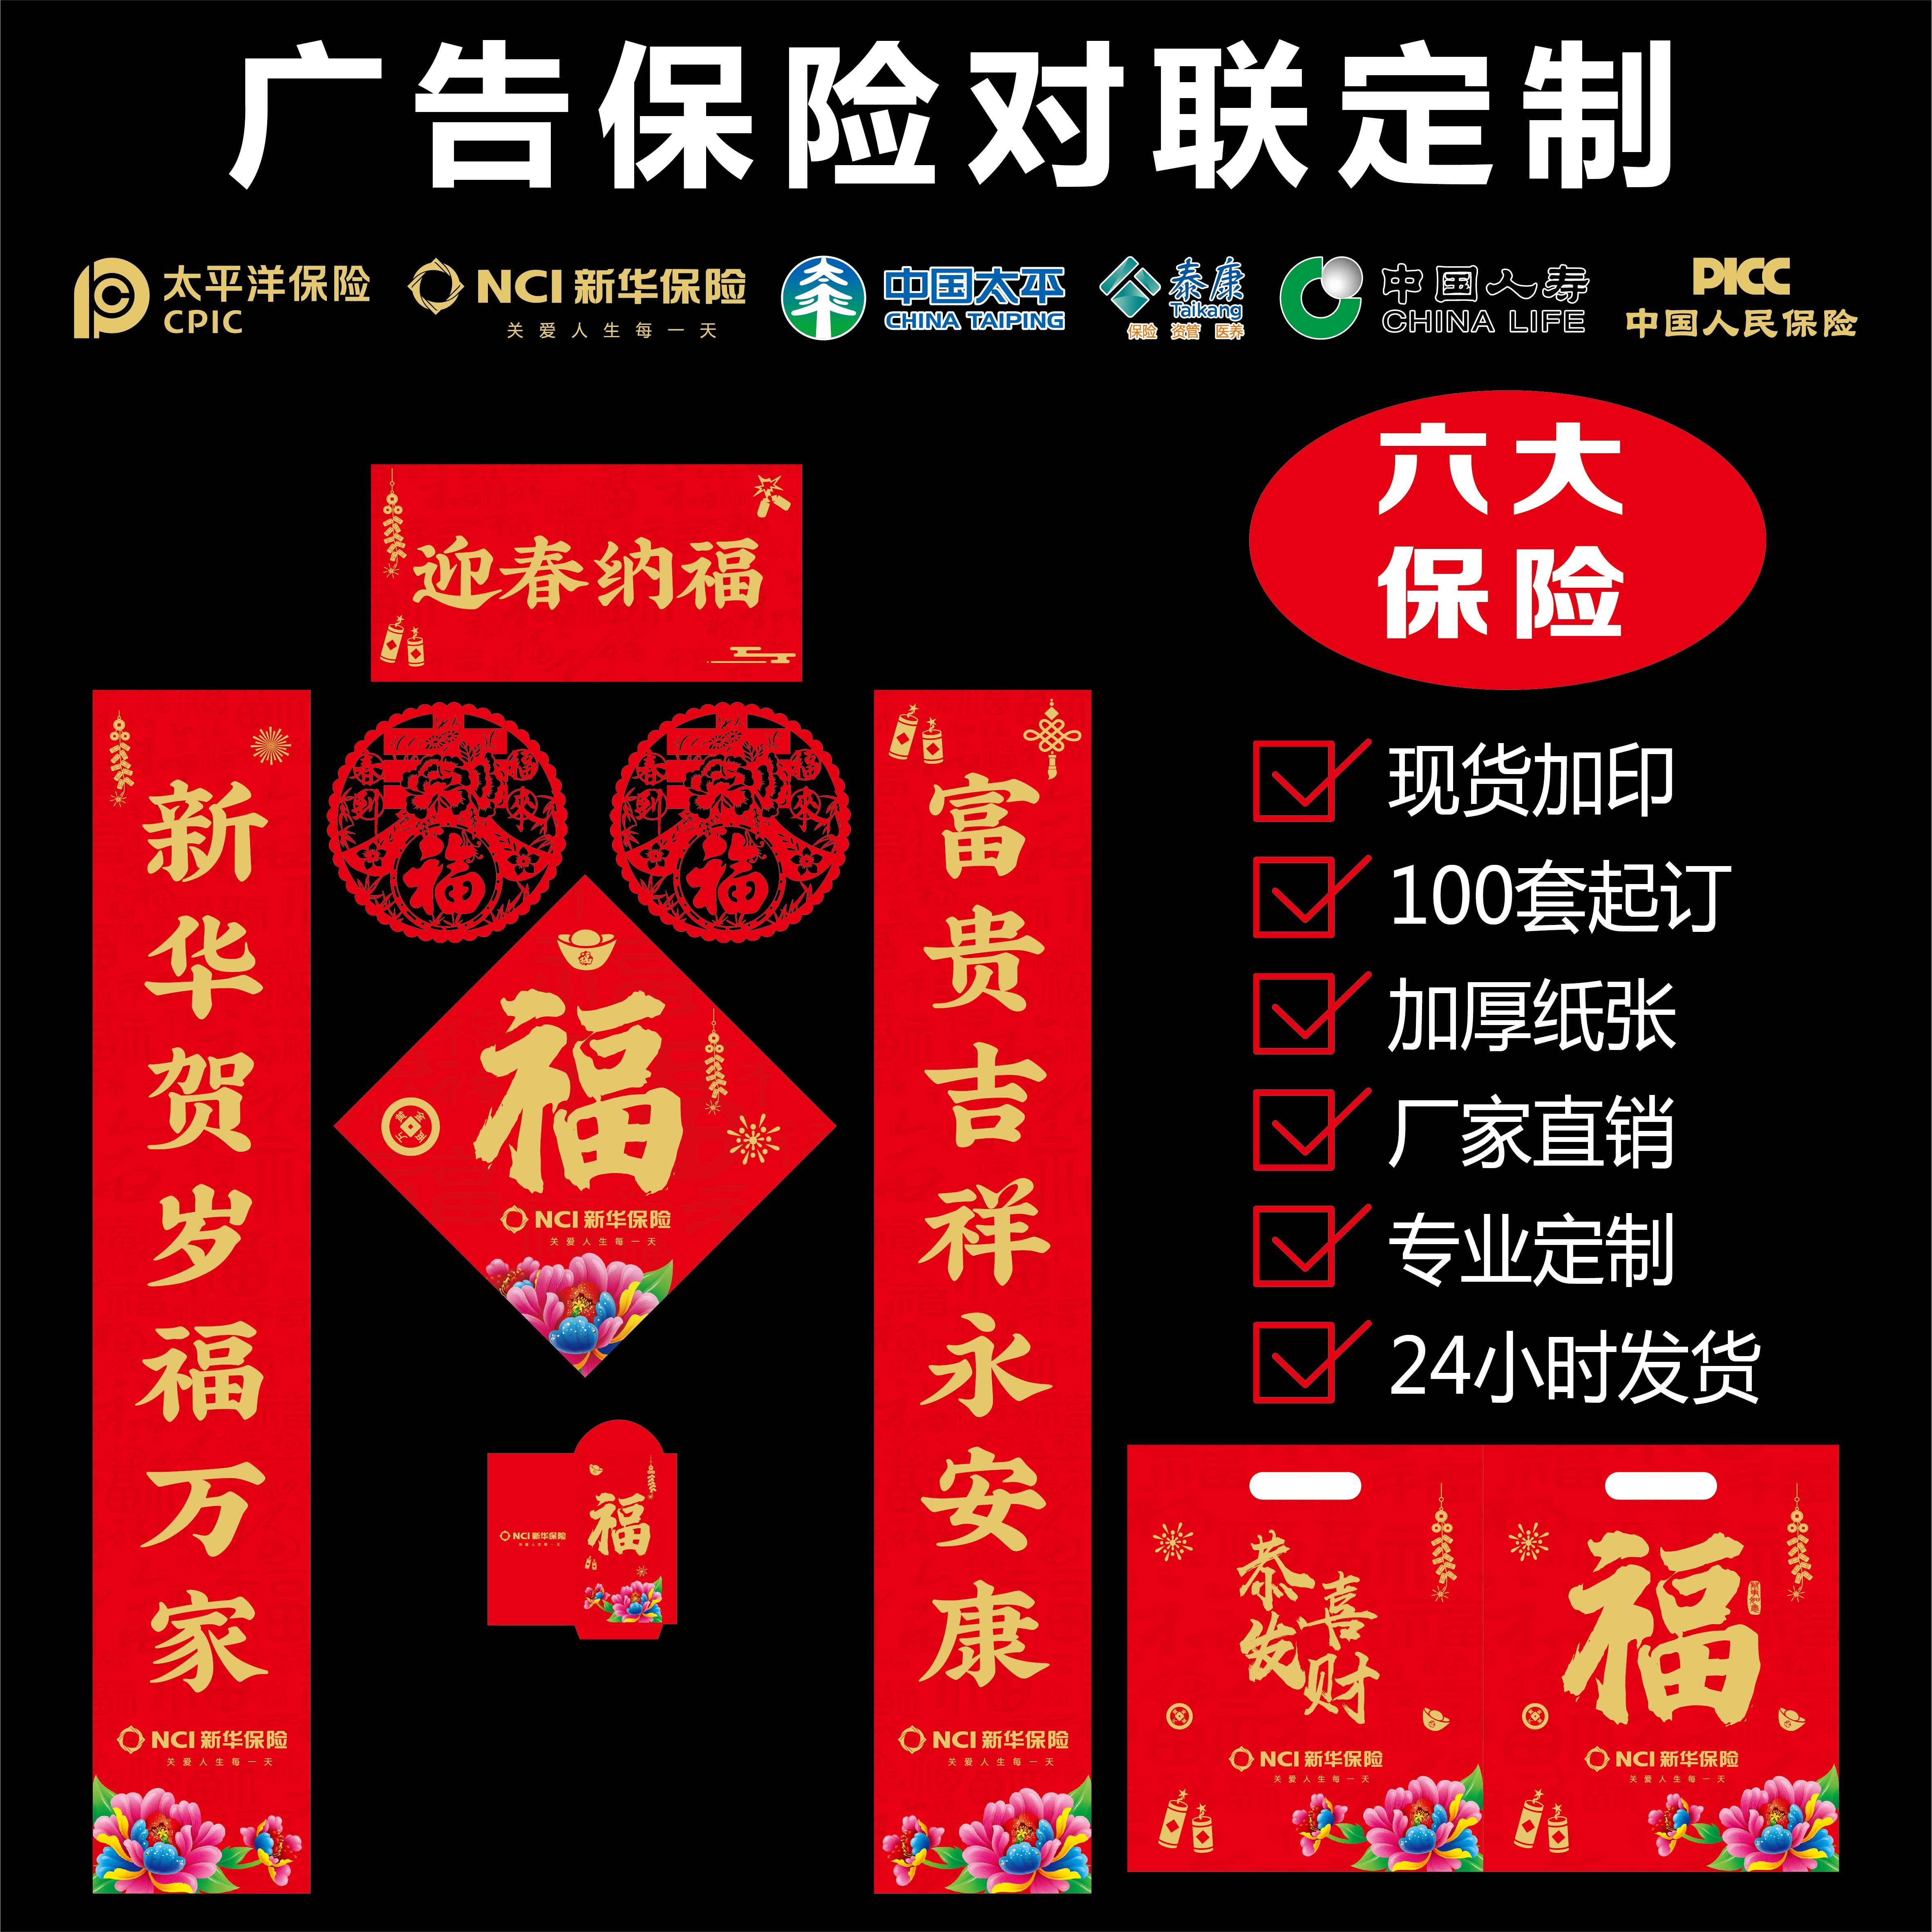 2021 advertising to the United Spring Festival Union custom picc Taiping Life Pacific Xinhua Taikang Insurance pair spot